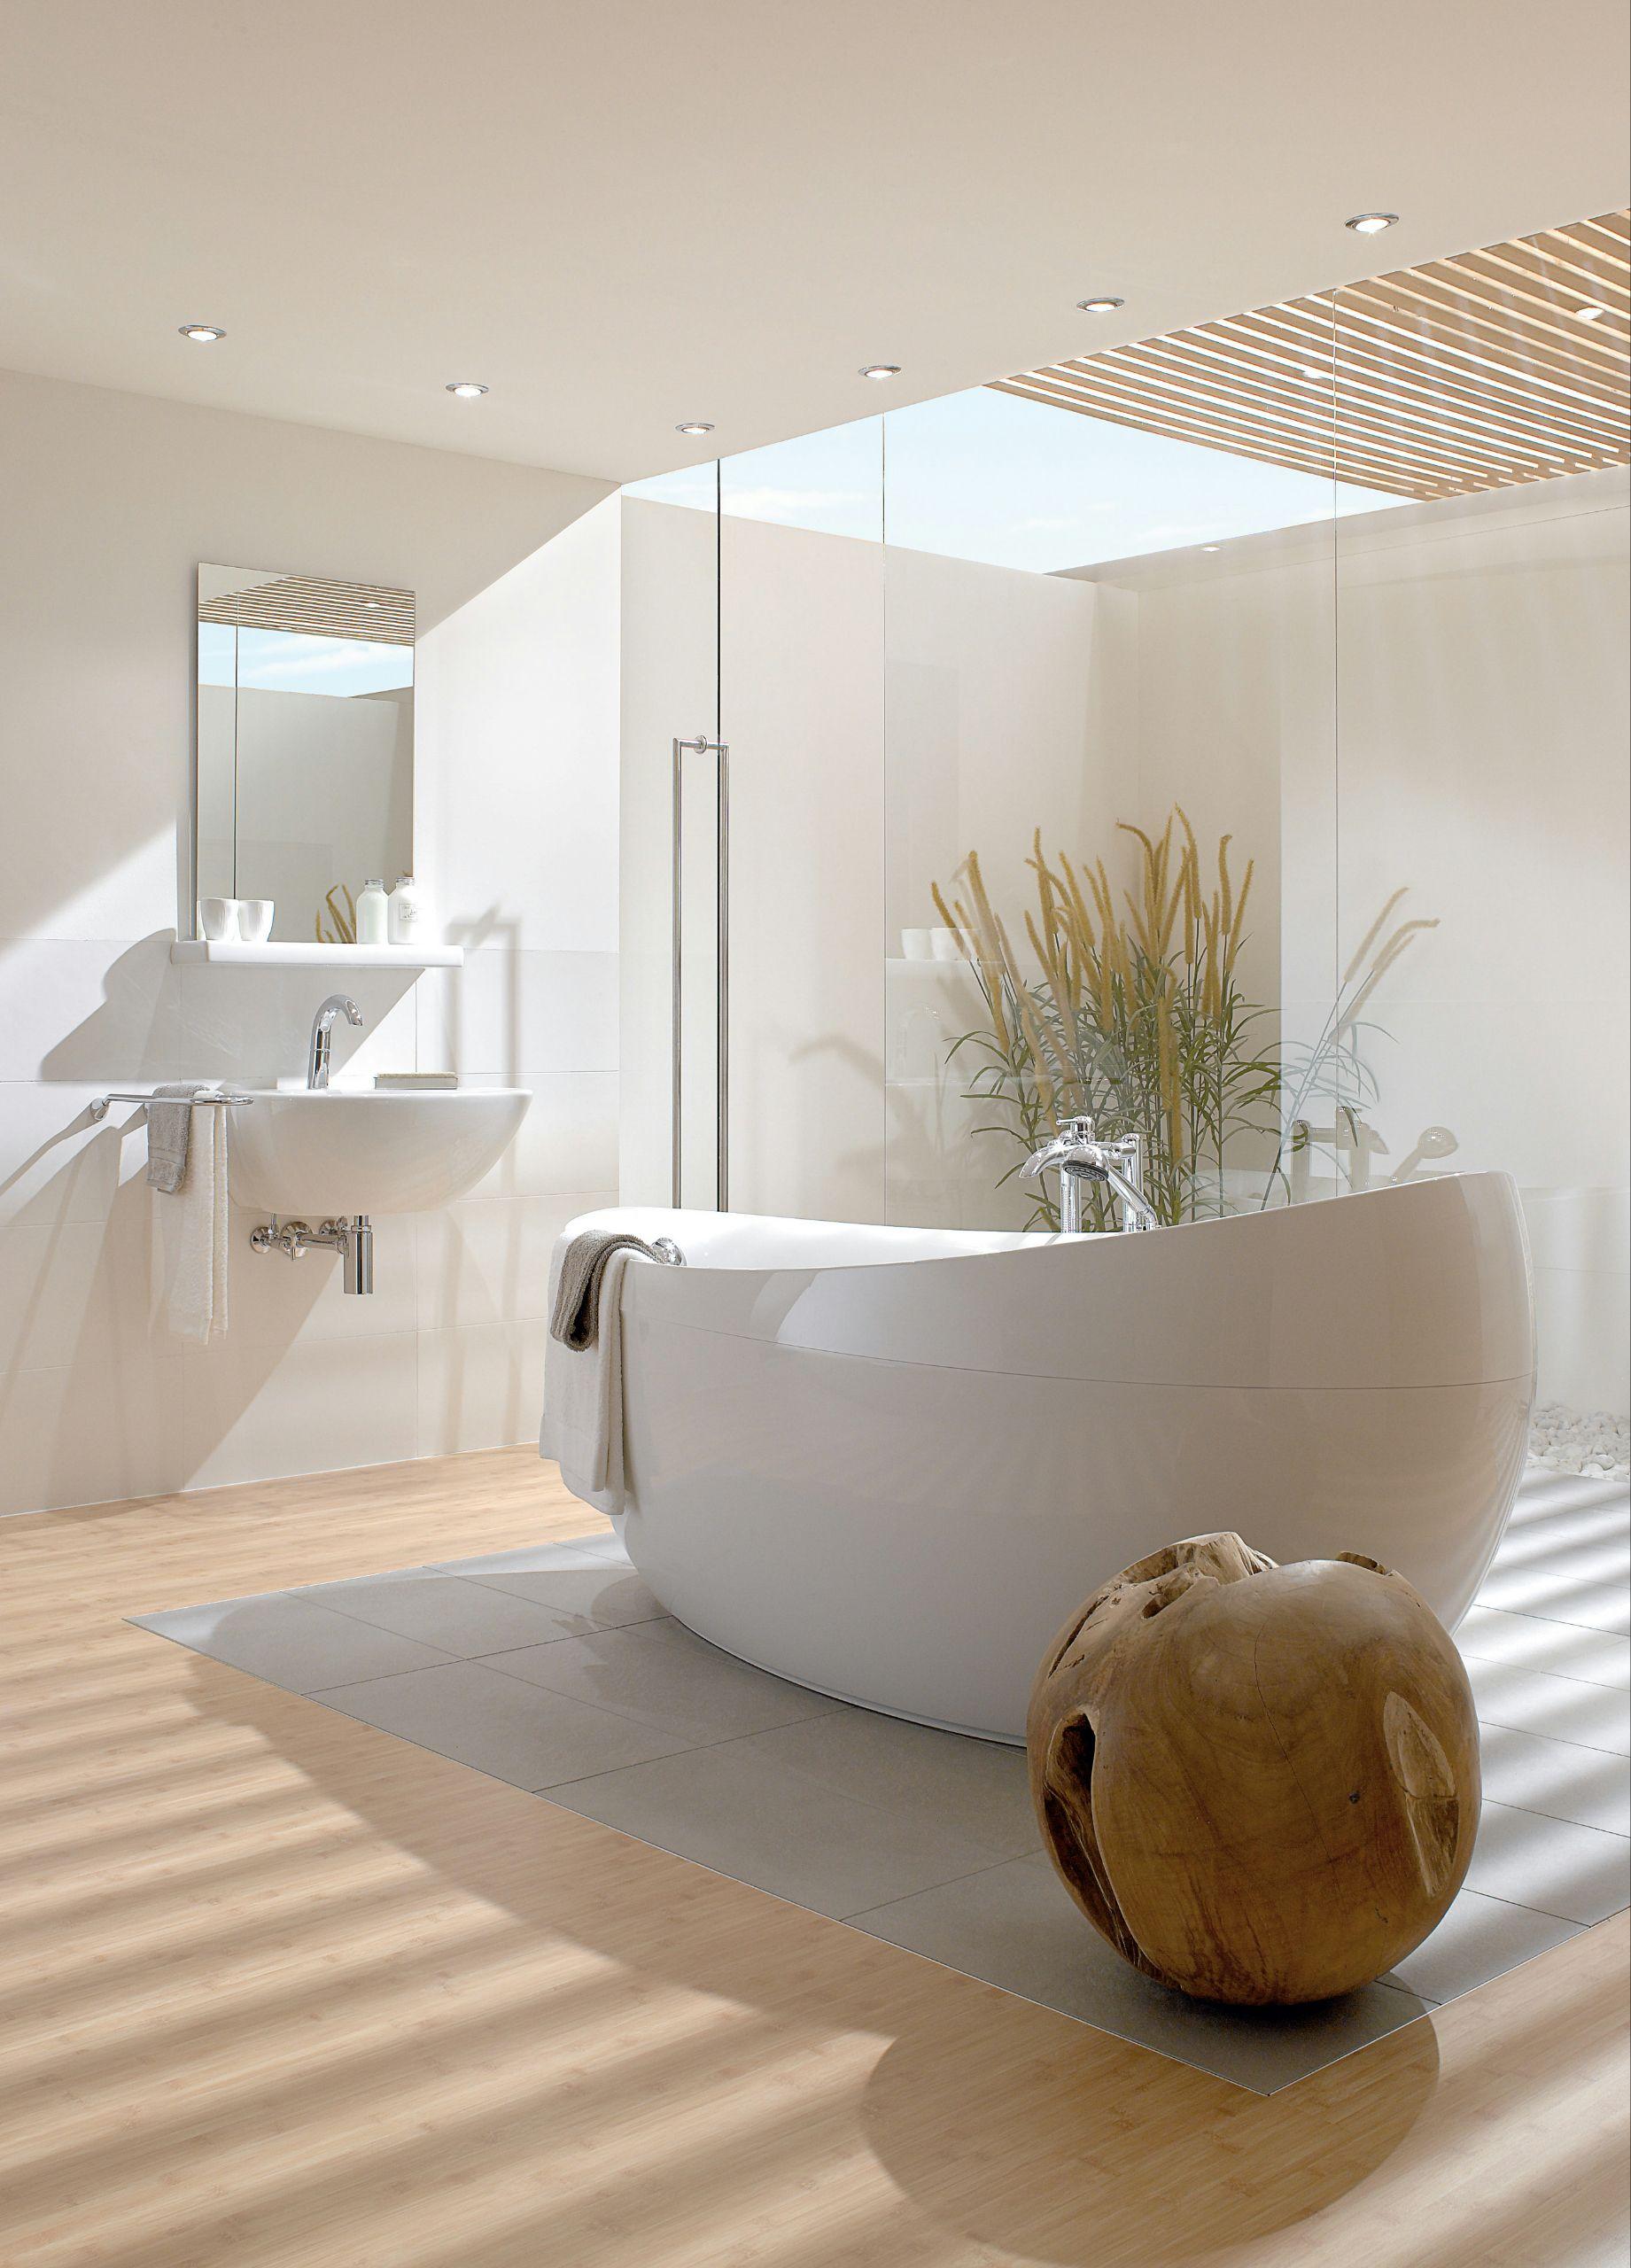 Bathtub Aveo Collection By Villeroy Boch Decoracion De Banos Modernos Decoracion Banos Banos Interiores